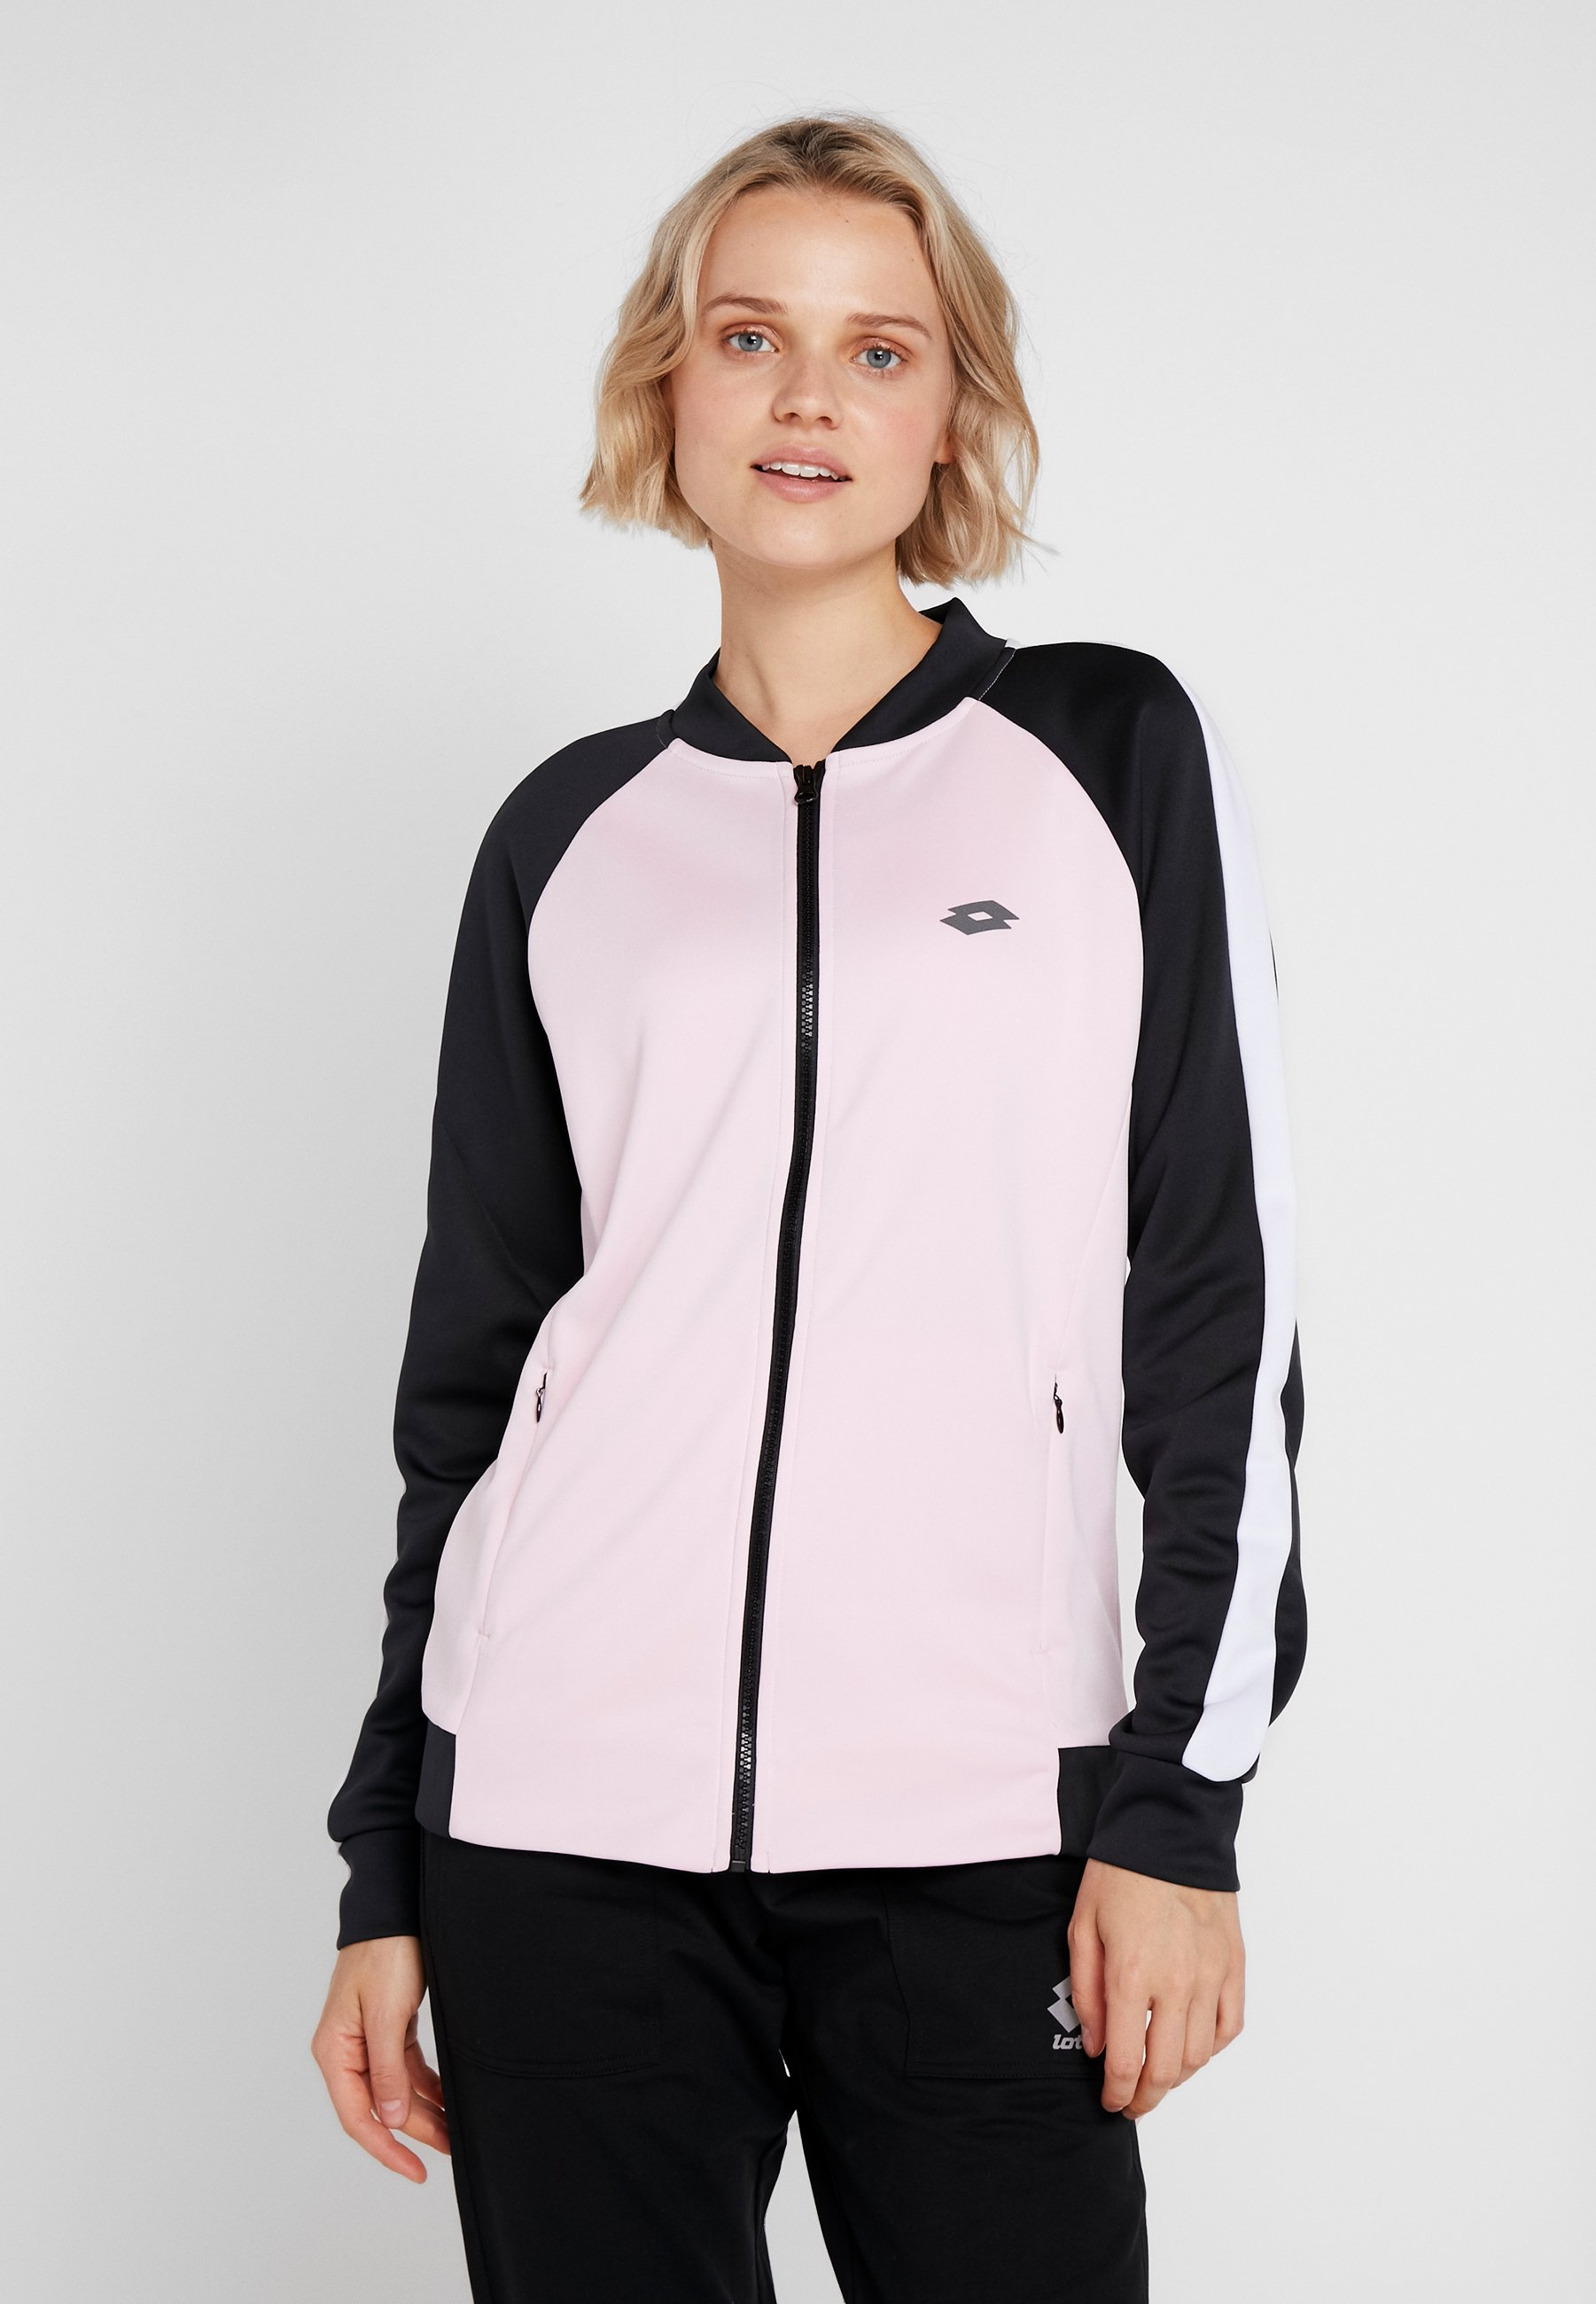 vabene jacket - trainingsjacke - pink cherry/all black